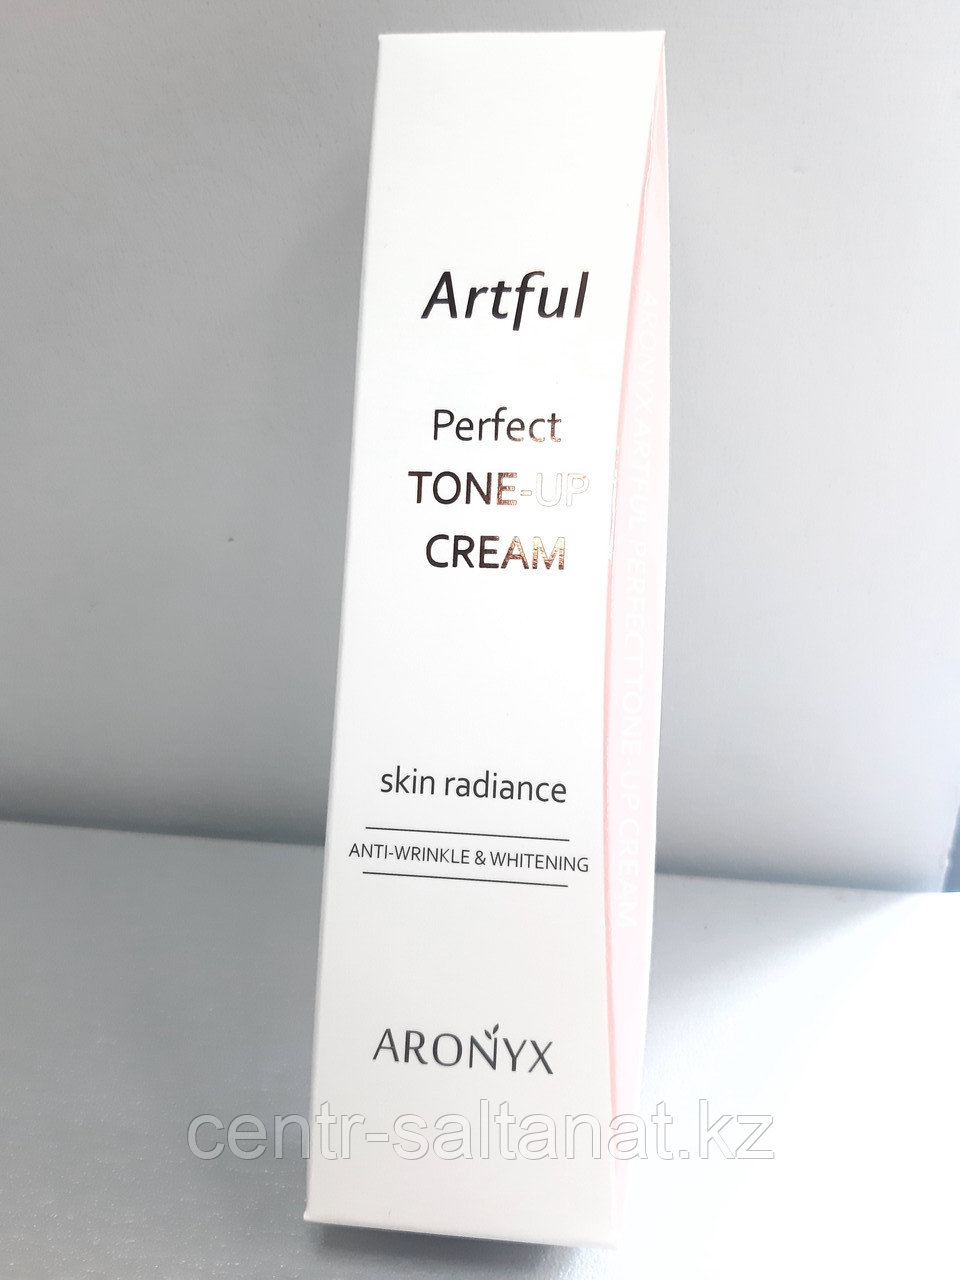 Осветляющий крем Aronyx Artful Perfect Tone-up Cream 50 мл